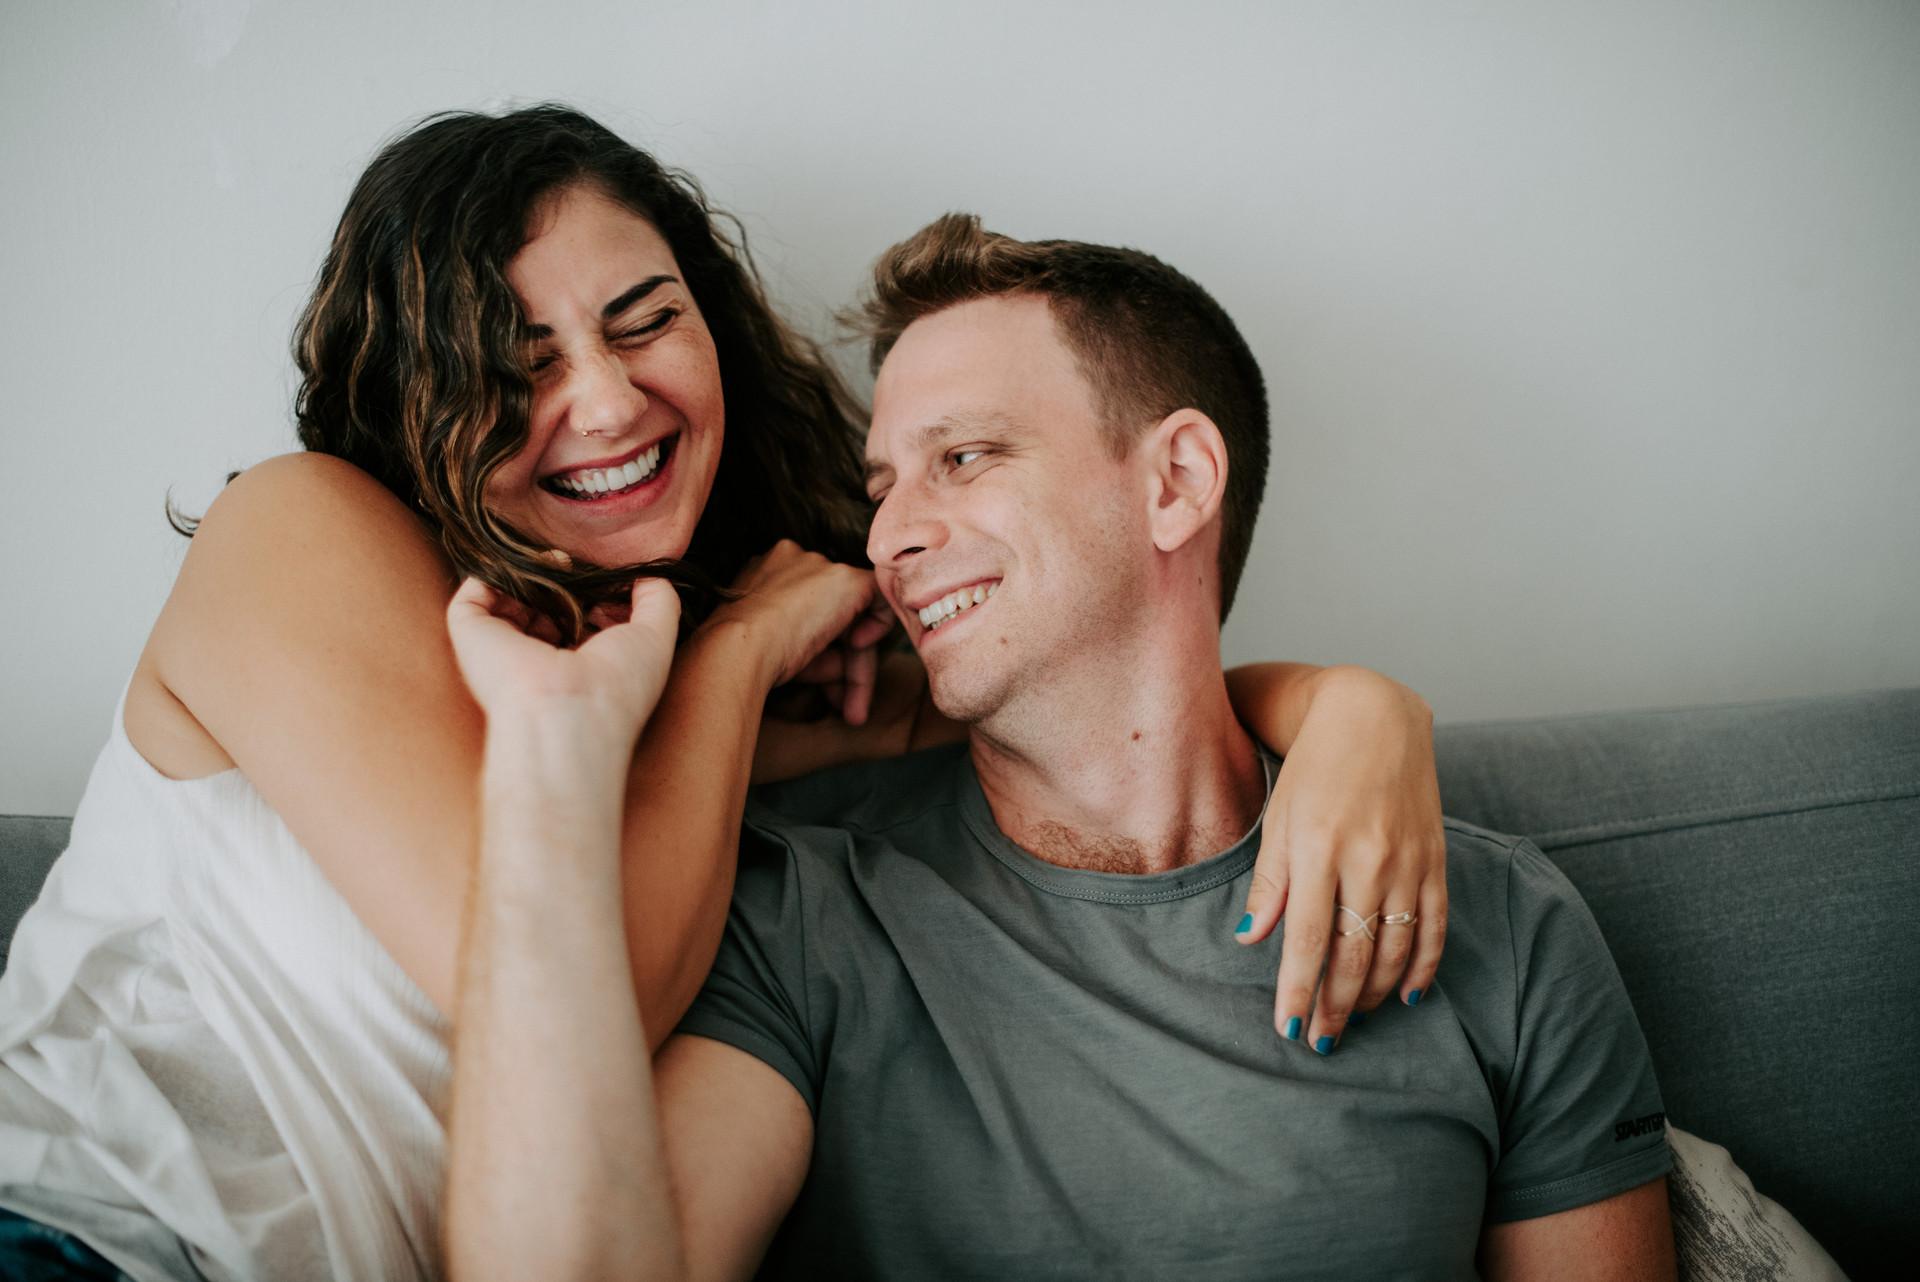 Natalie&Benny-80.jpg